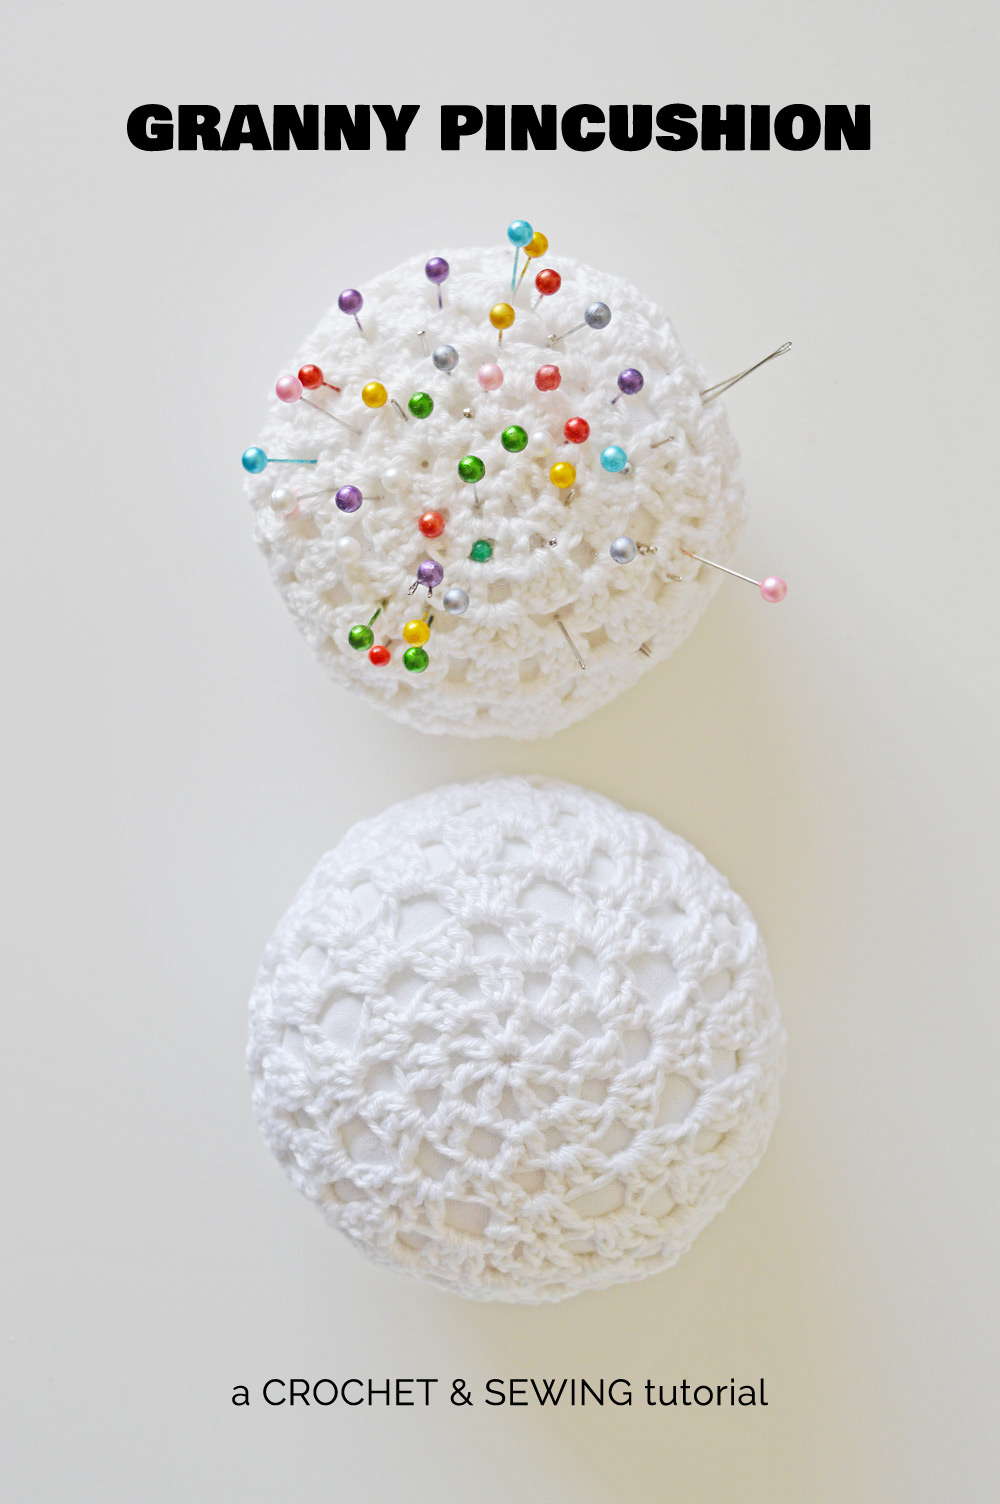 DIY crochet pincushion tutorial + pattern